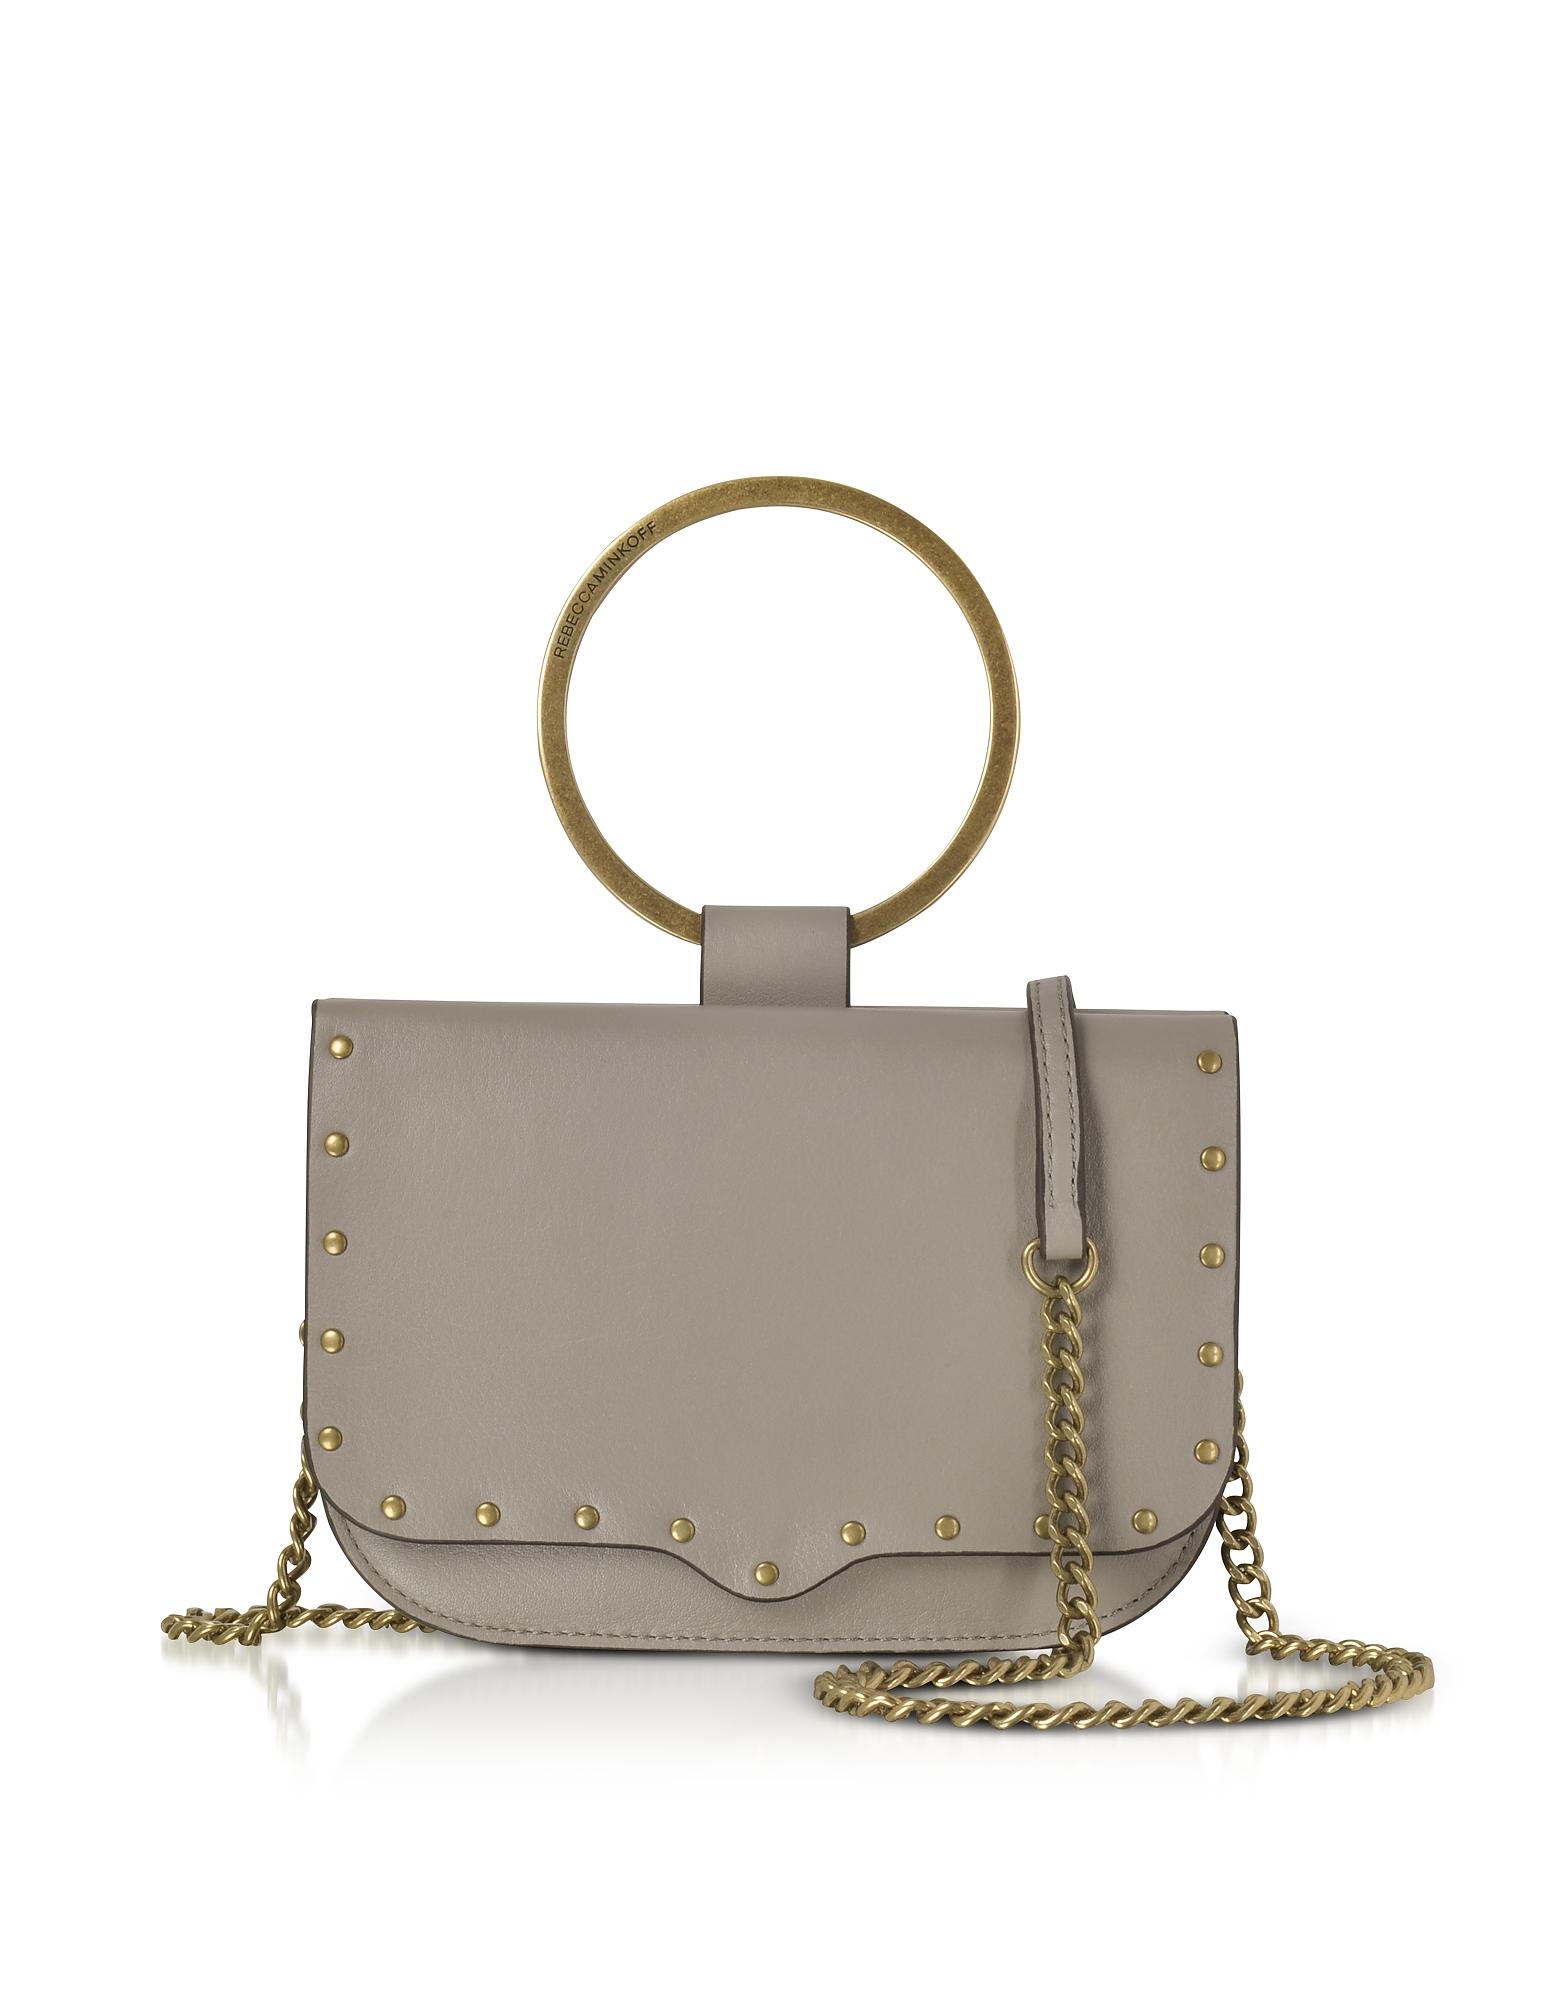 Rebecca Minkoff Handbags, Taupe Leather Ring Crossbody Bag